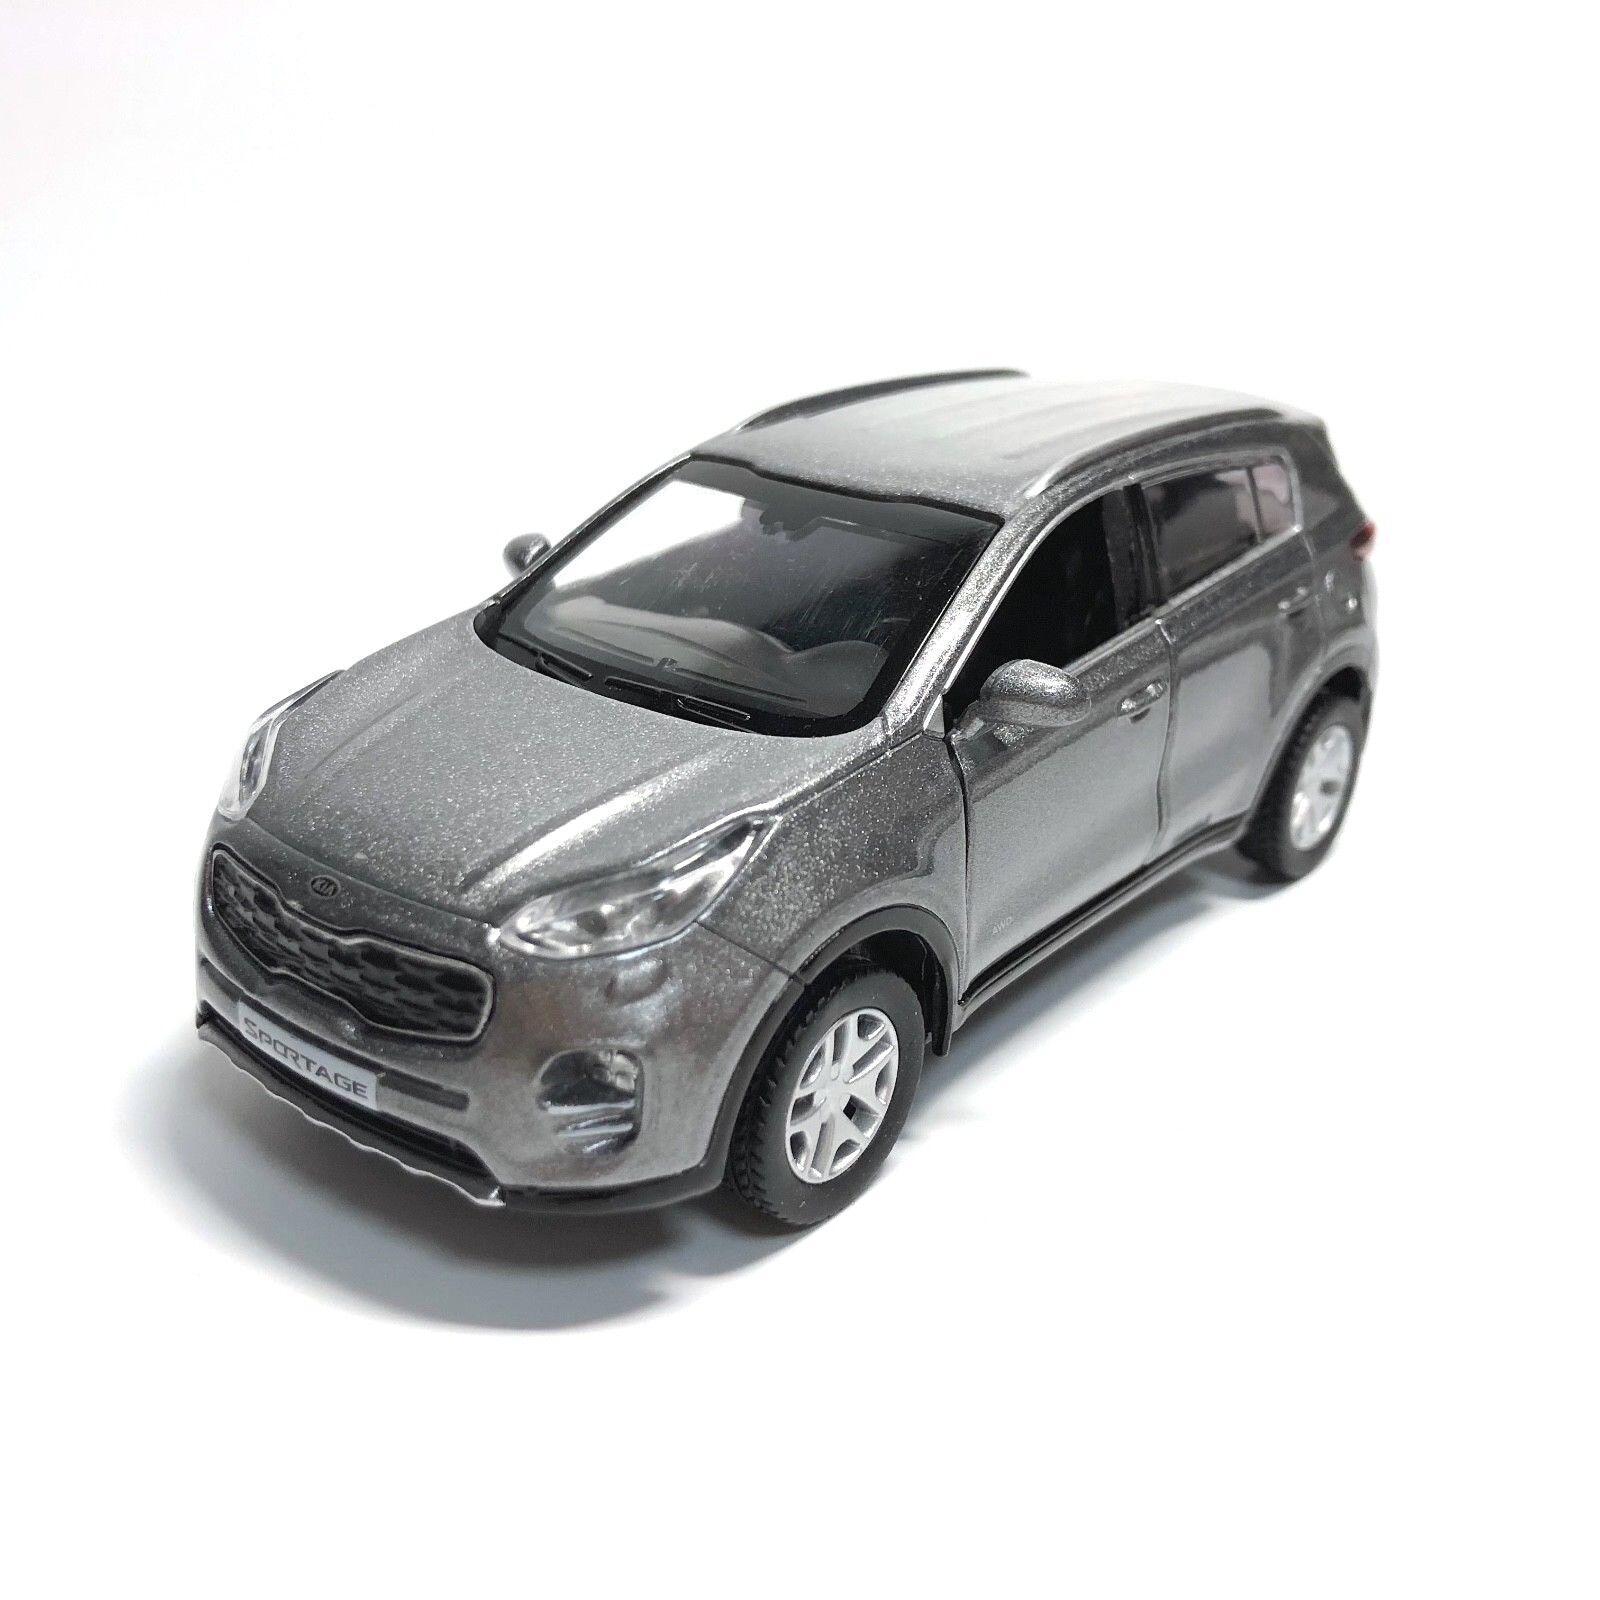 Kia Sportage White Diecast Model Car Scale 1:36